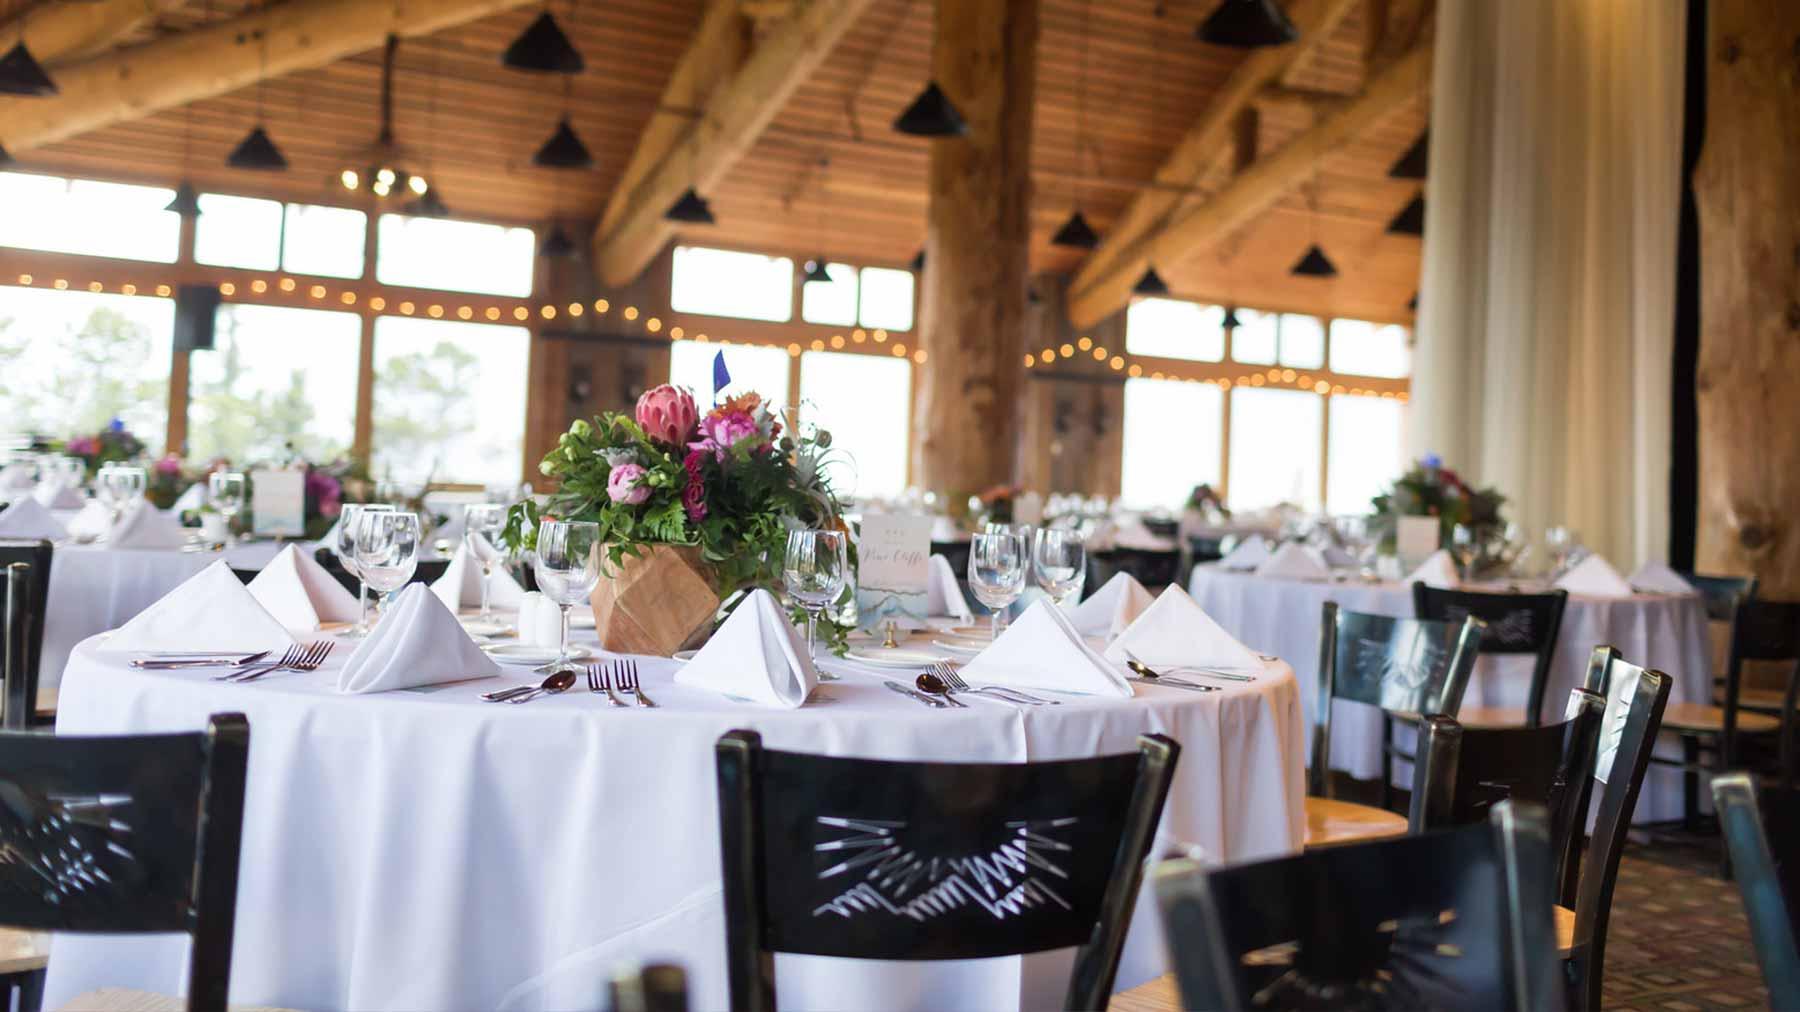 Winter Park Resort Weddings